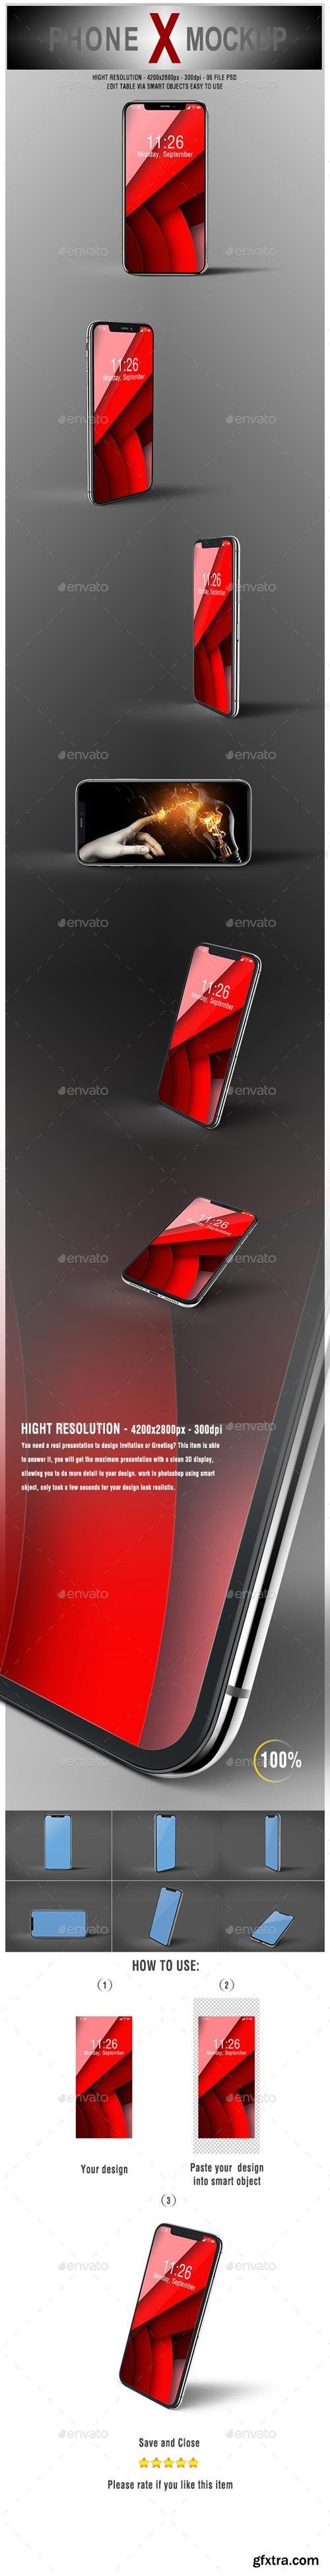 GraphicRiver - Phone X Mockup - 20751807